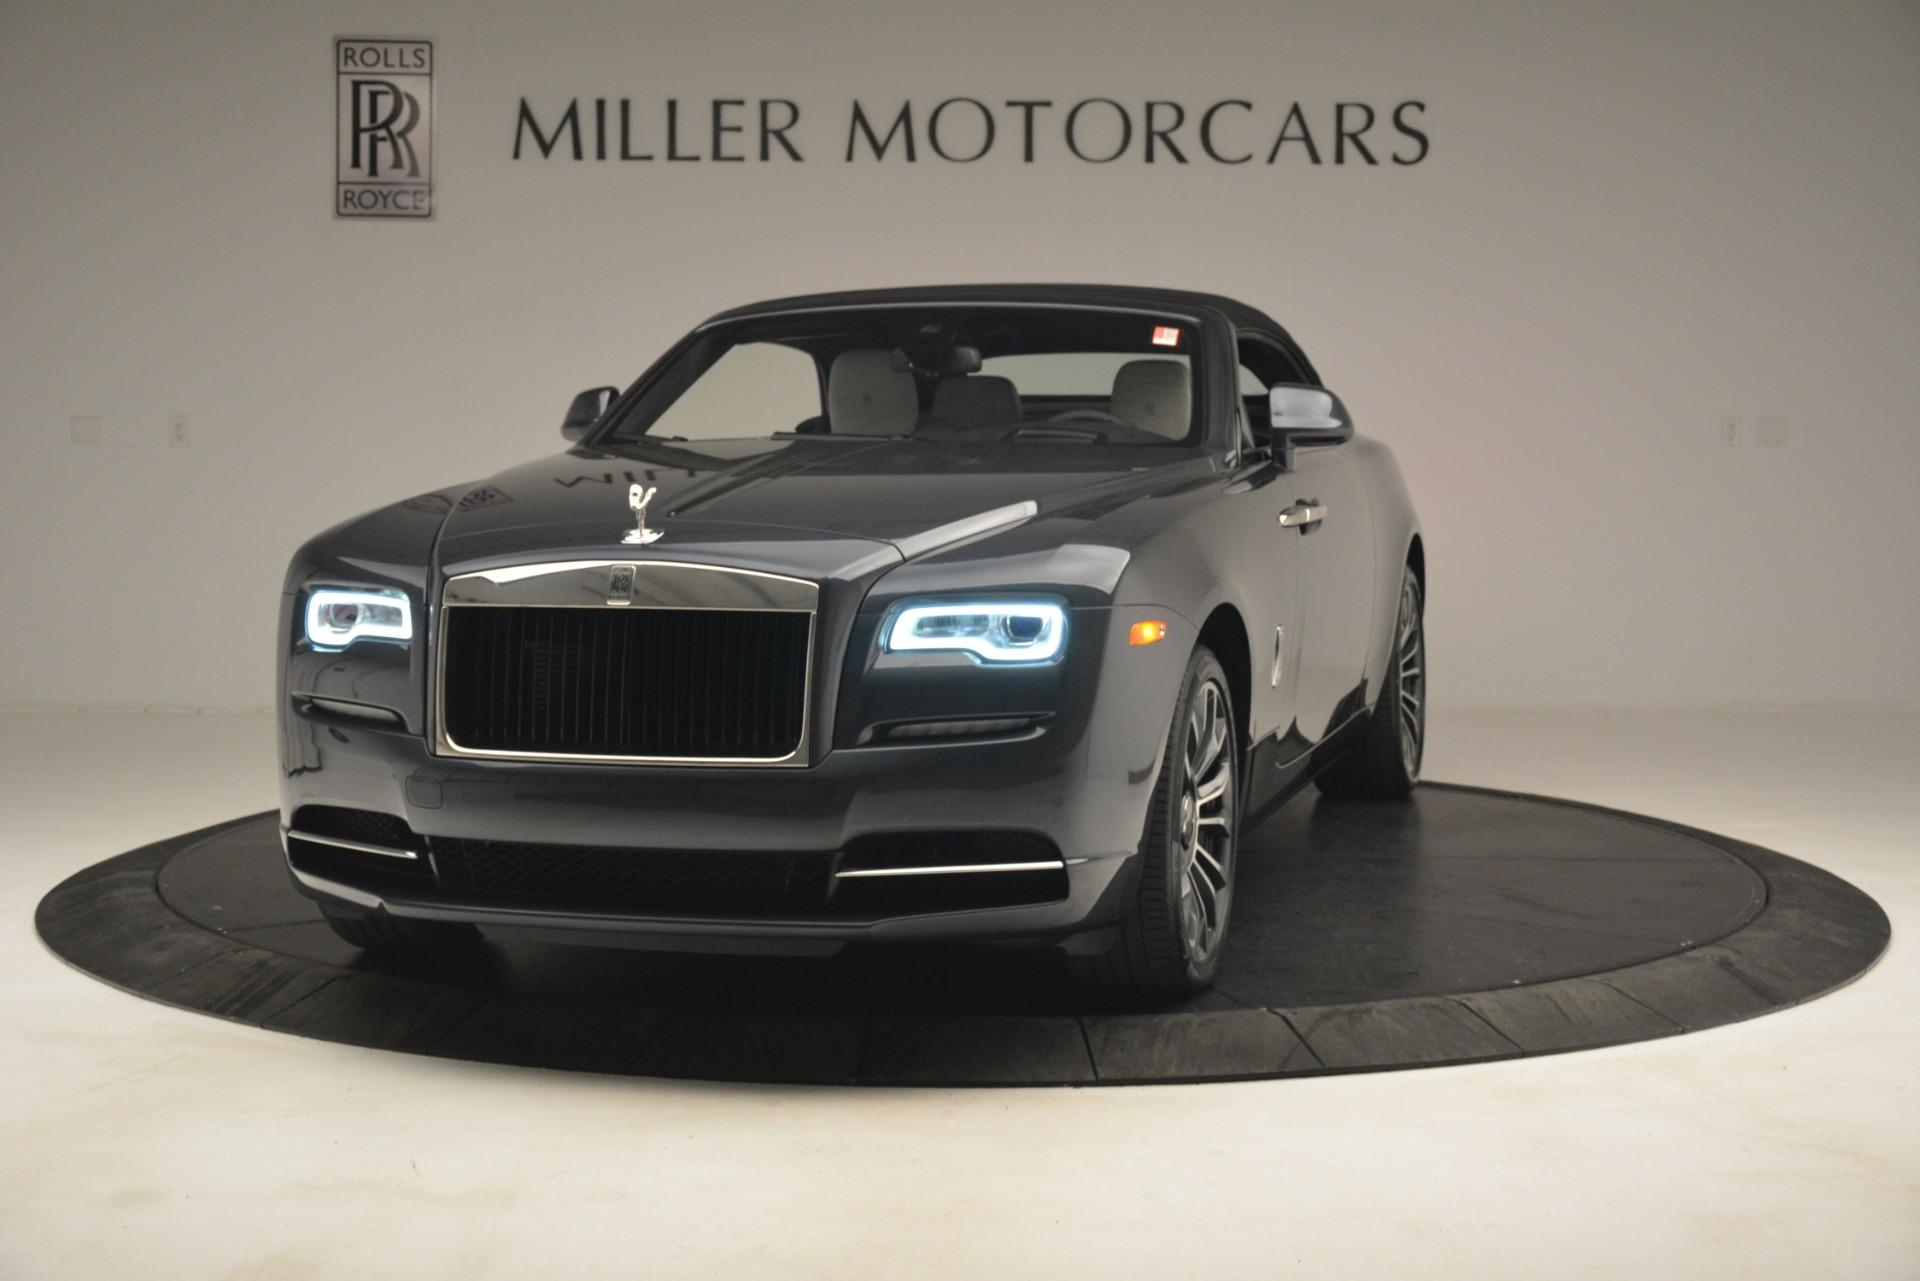 New 2019 Rolls-Royce Dawn  For Sale 403225 In Greenwich, CT